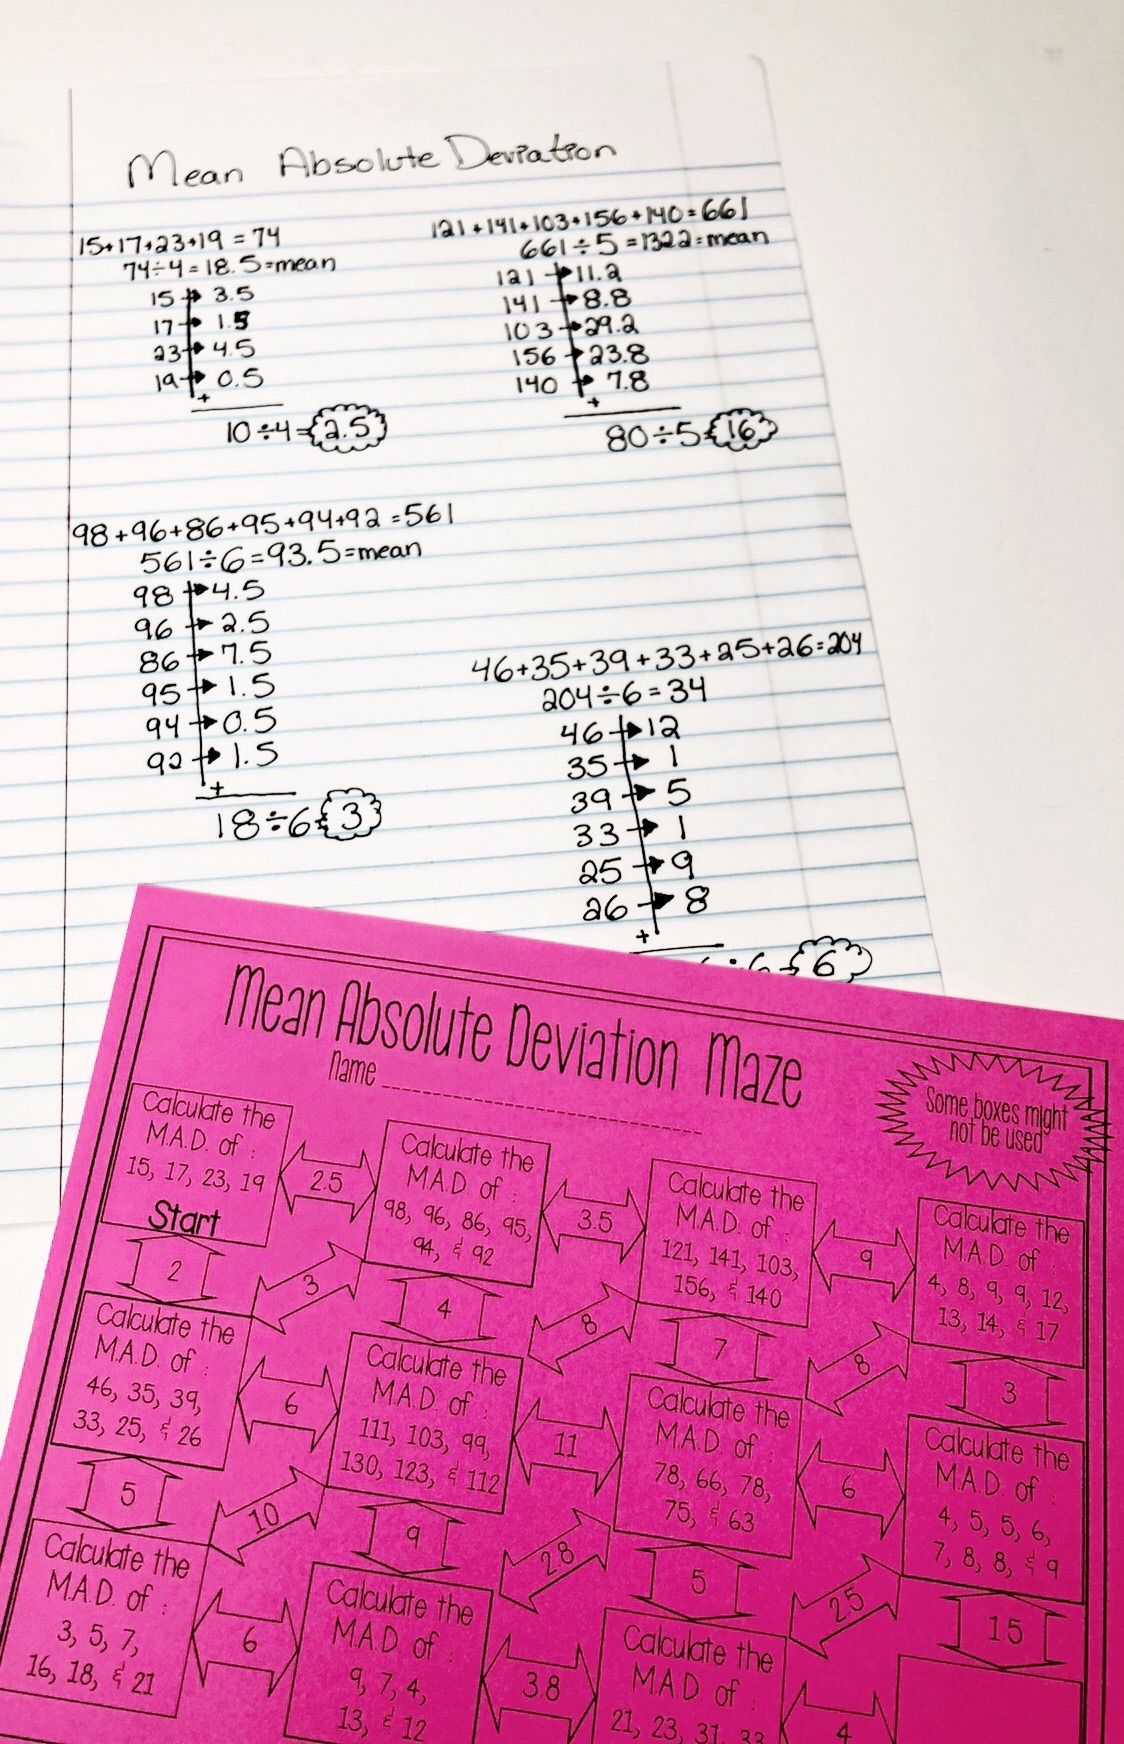 Mean Absolute Deviation Worksheet - Maze Activity   8th grade math  worksheets [ 1744 x 1124 Pixel ]